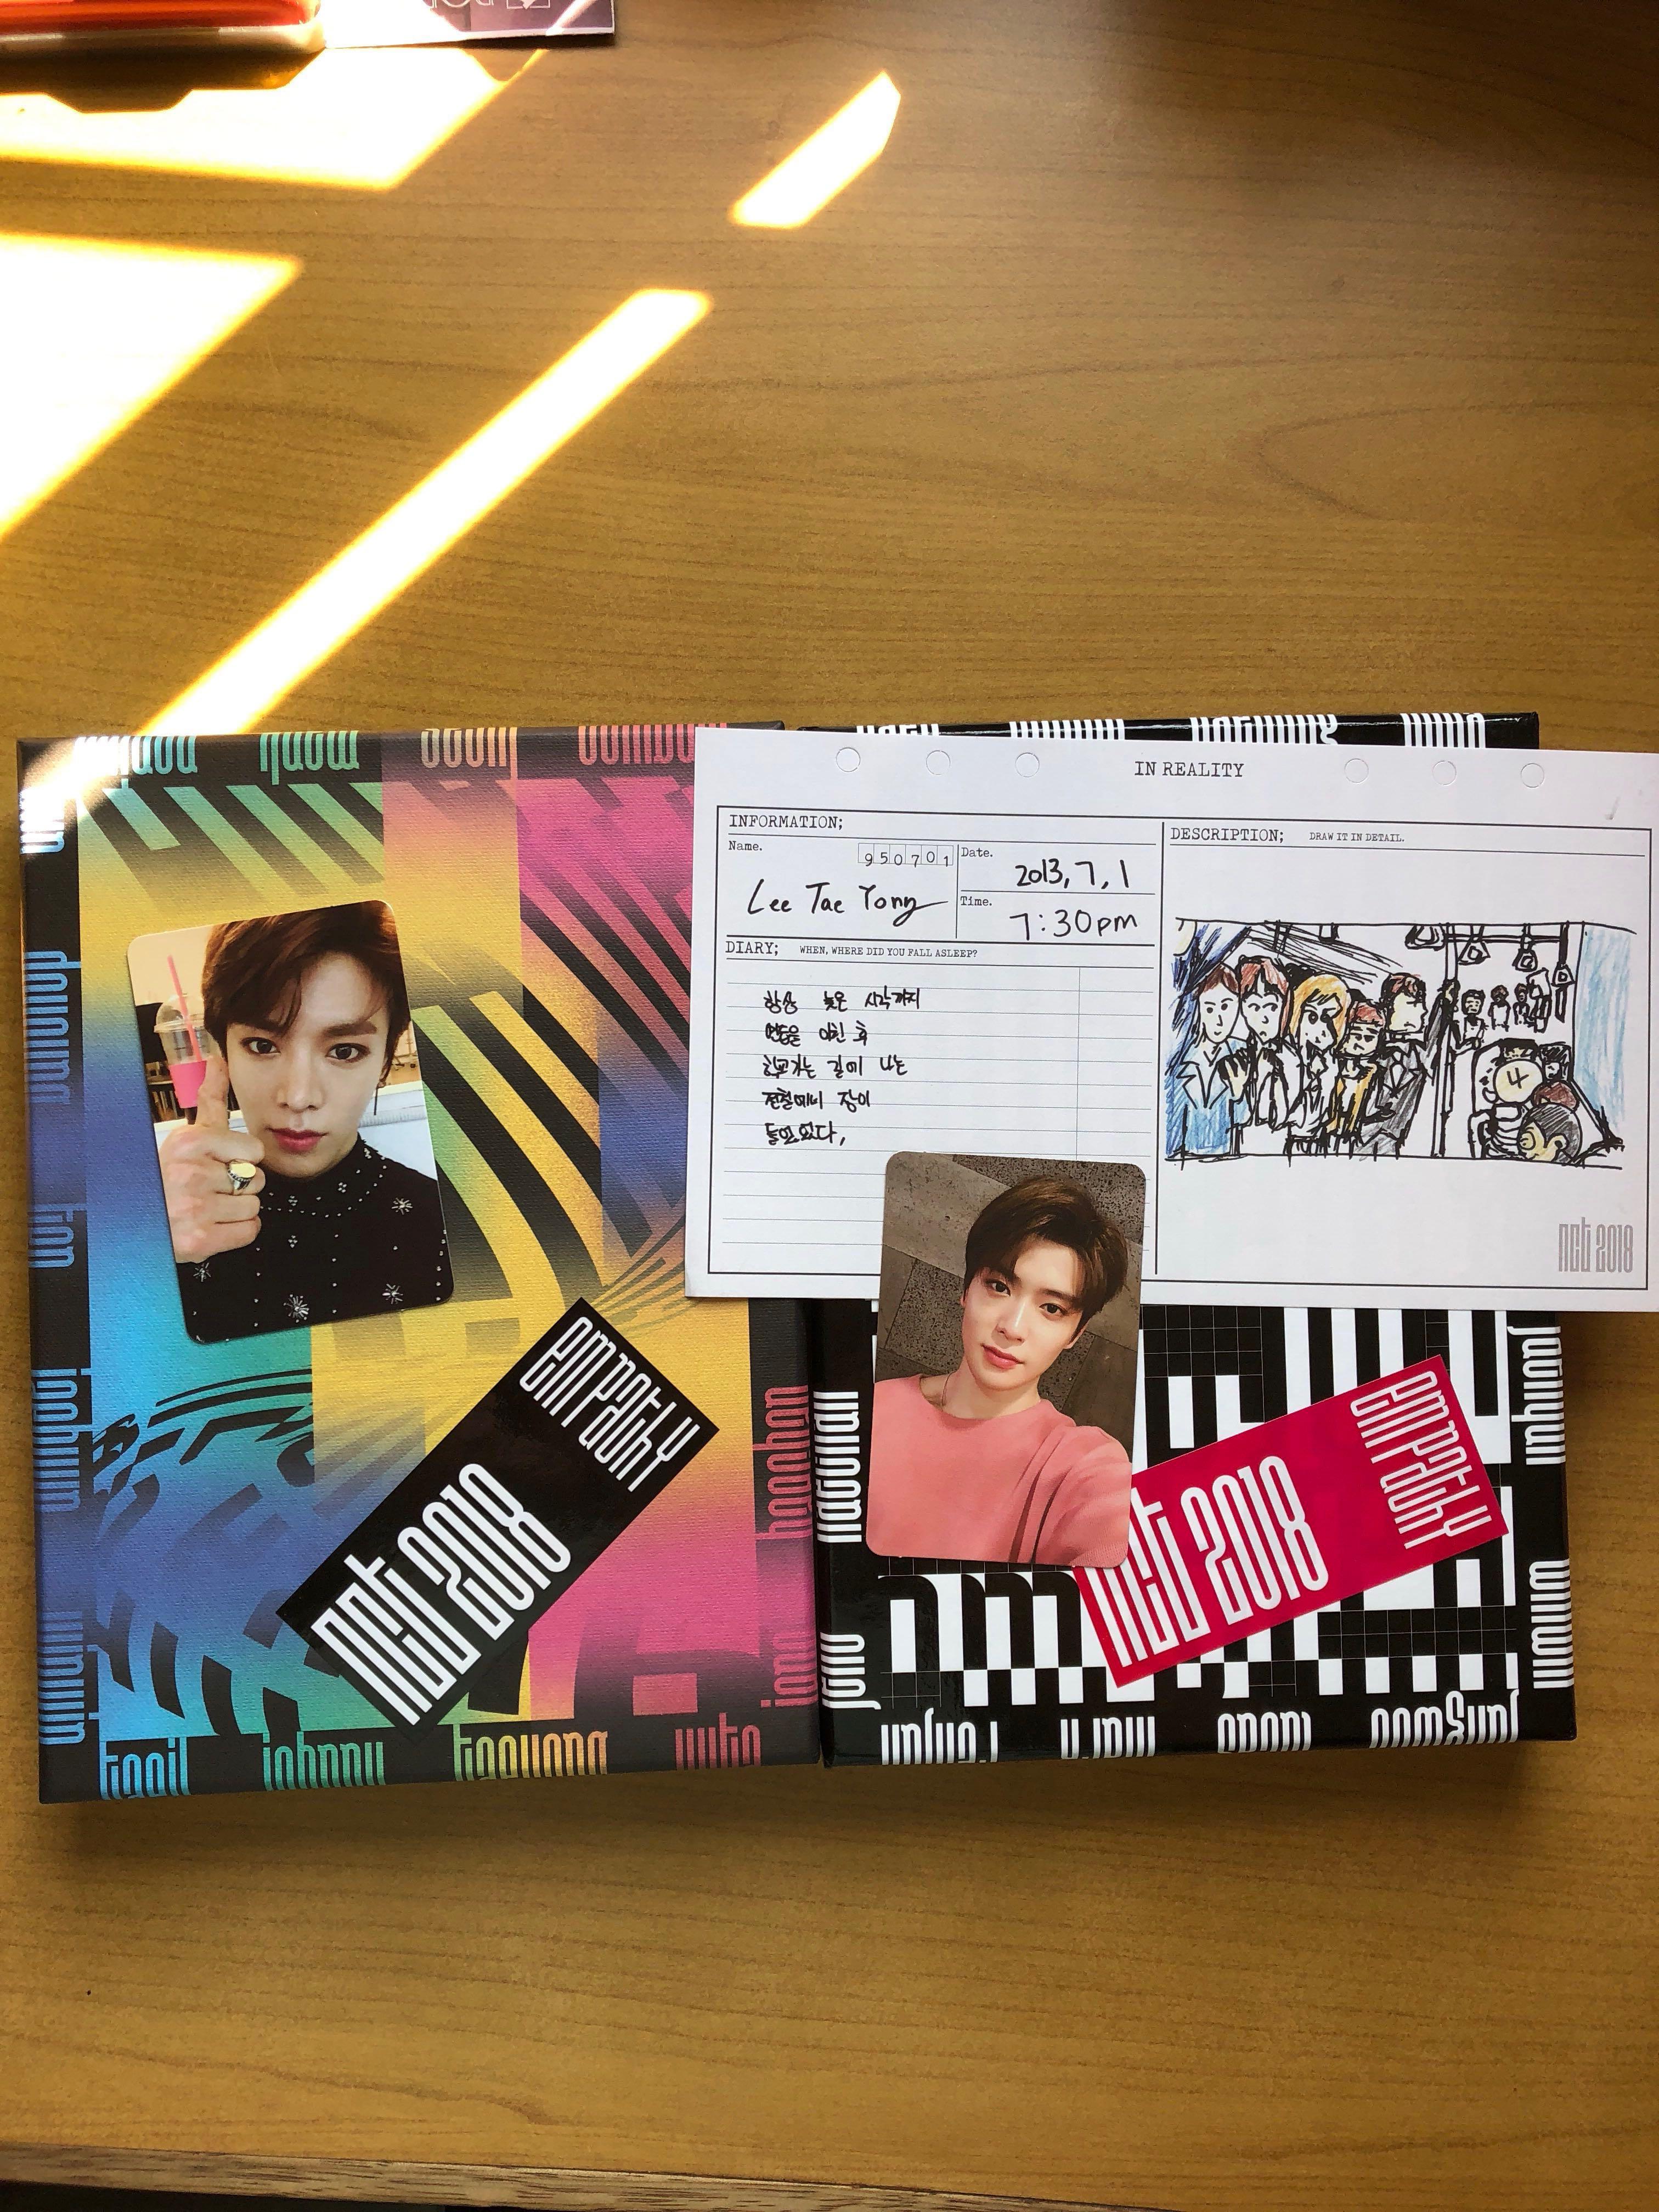 WTT NCT 2018 EMPATHY ALBUM PC AND DIARY, Entertainment, K